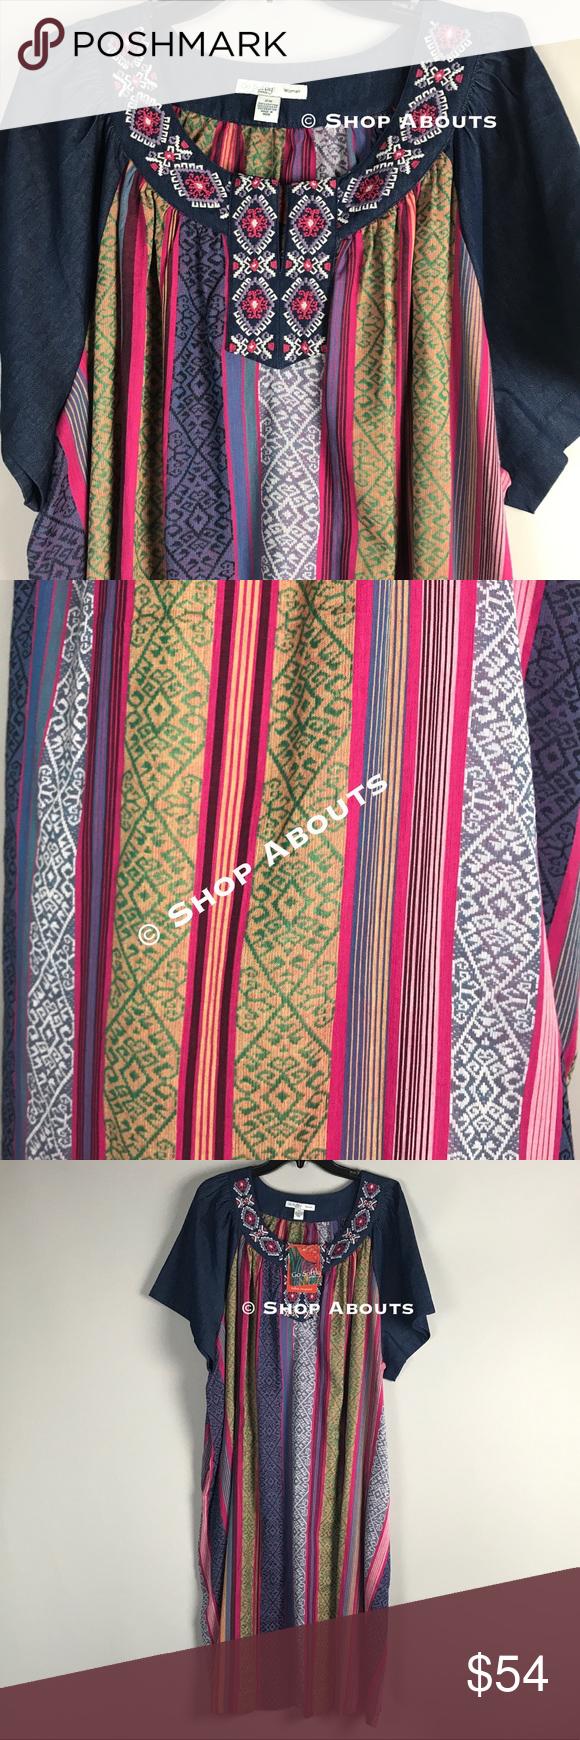 4907994935 Go Softly Plus Denim Patio Duster Muu House Dresd New with tags dark denim  patio dress